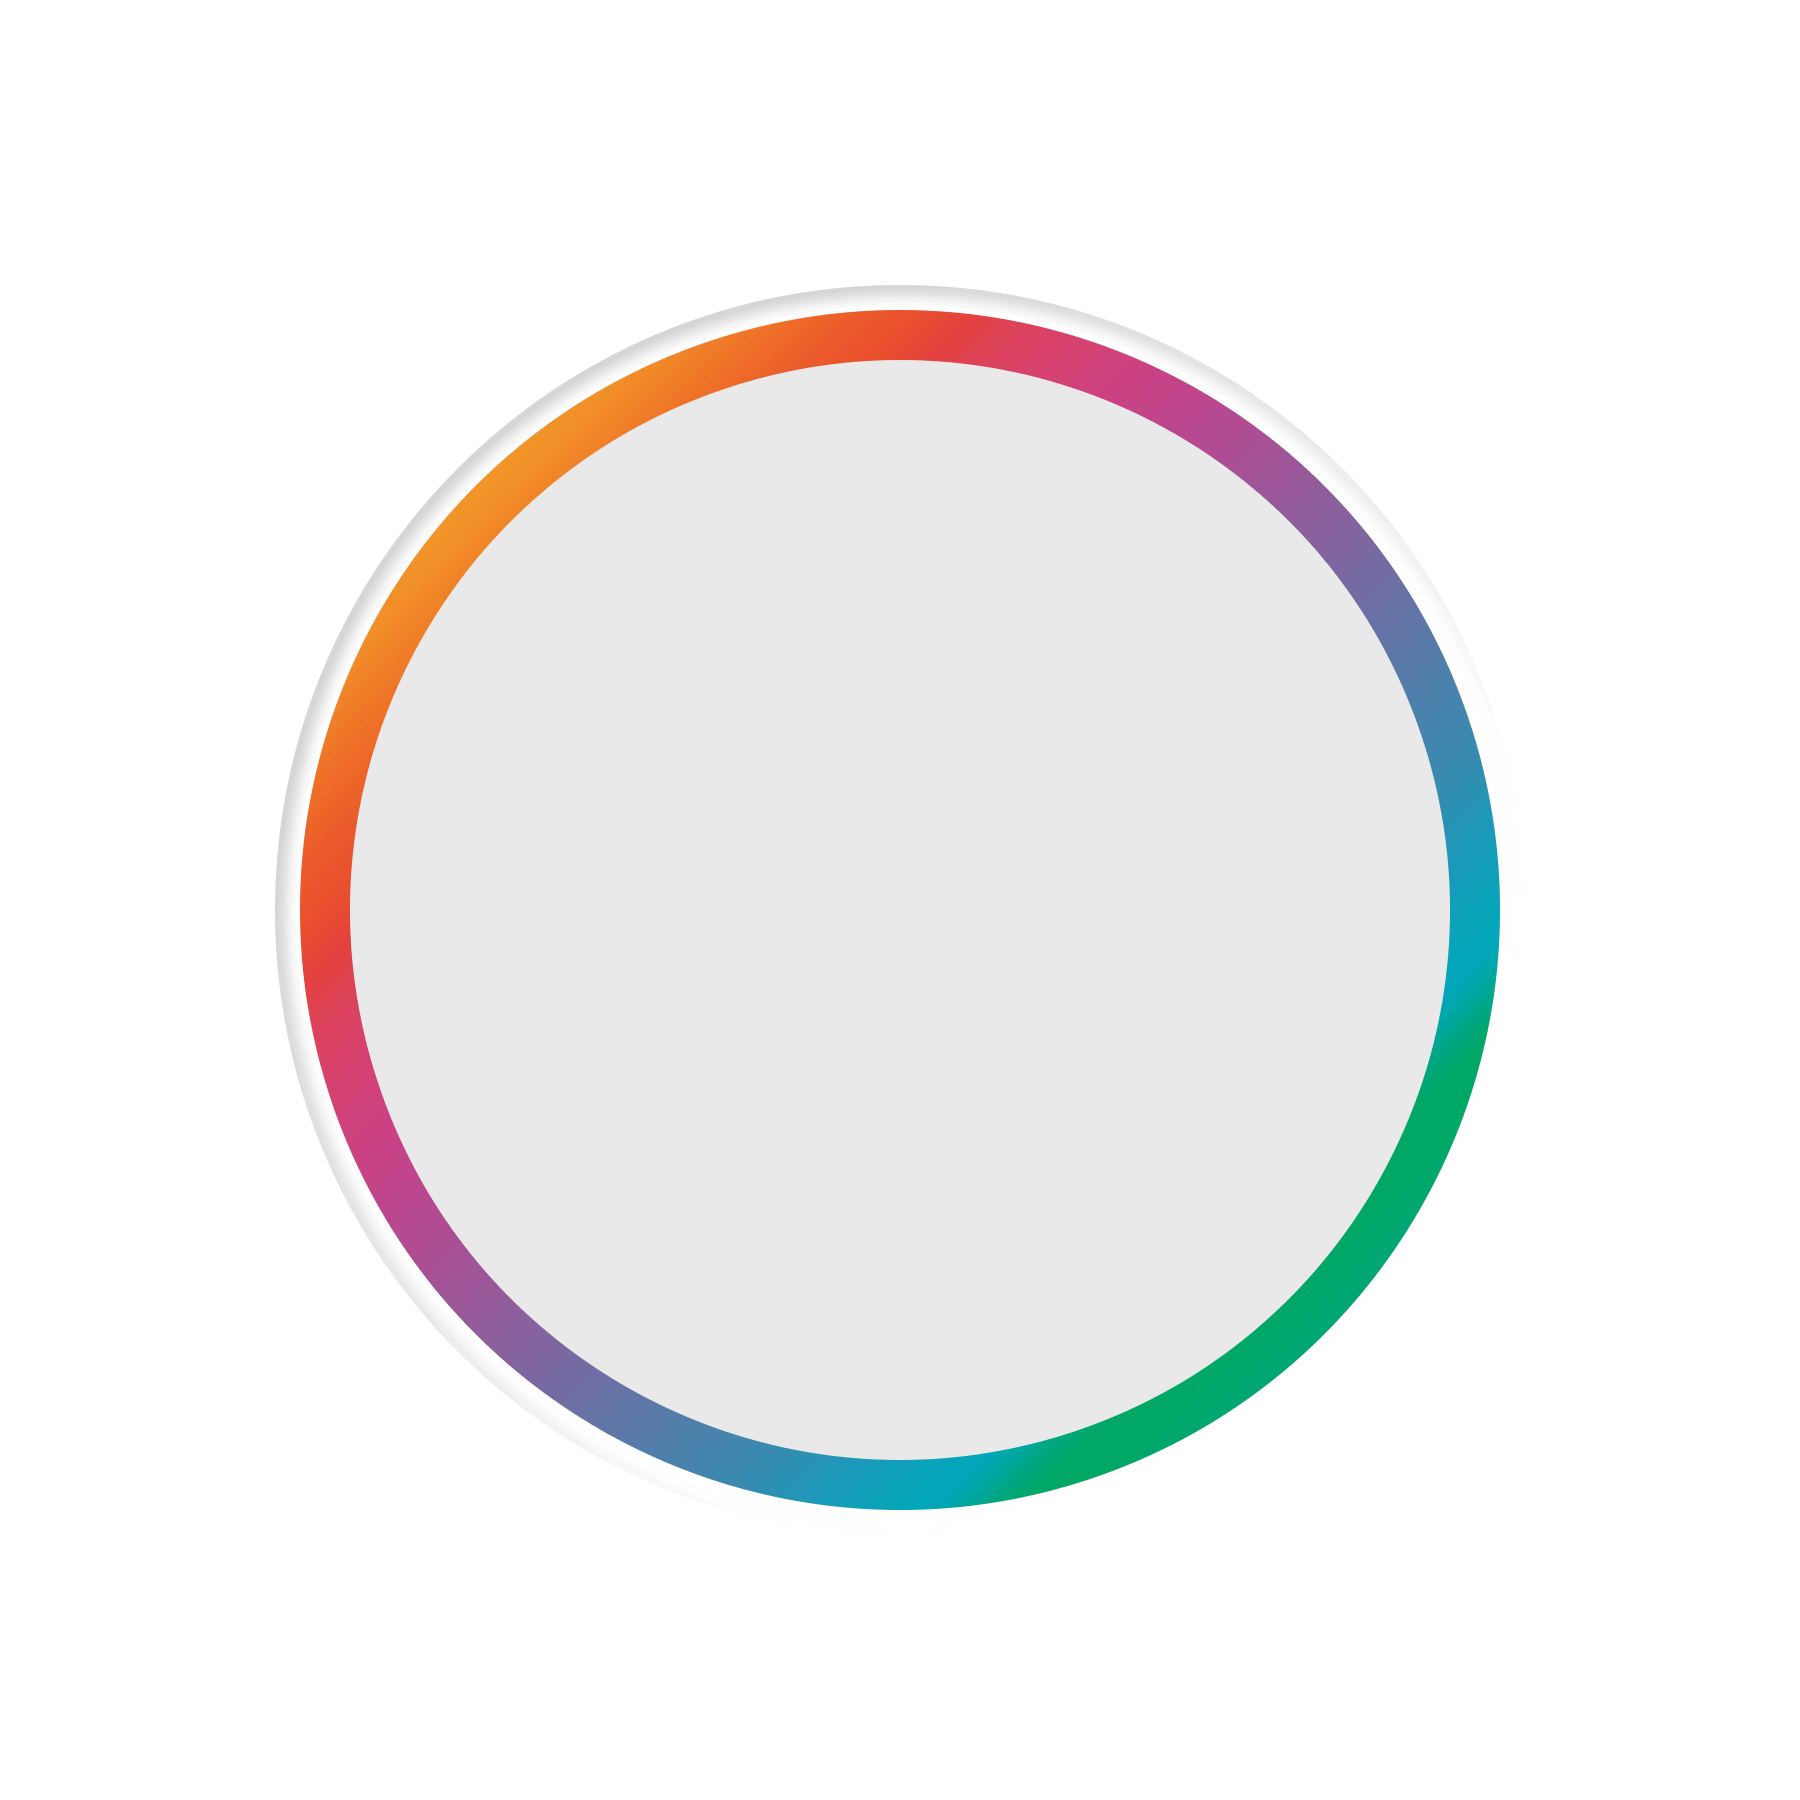 HTC VIVE Focus (B2B)